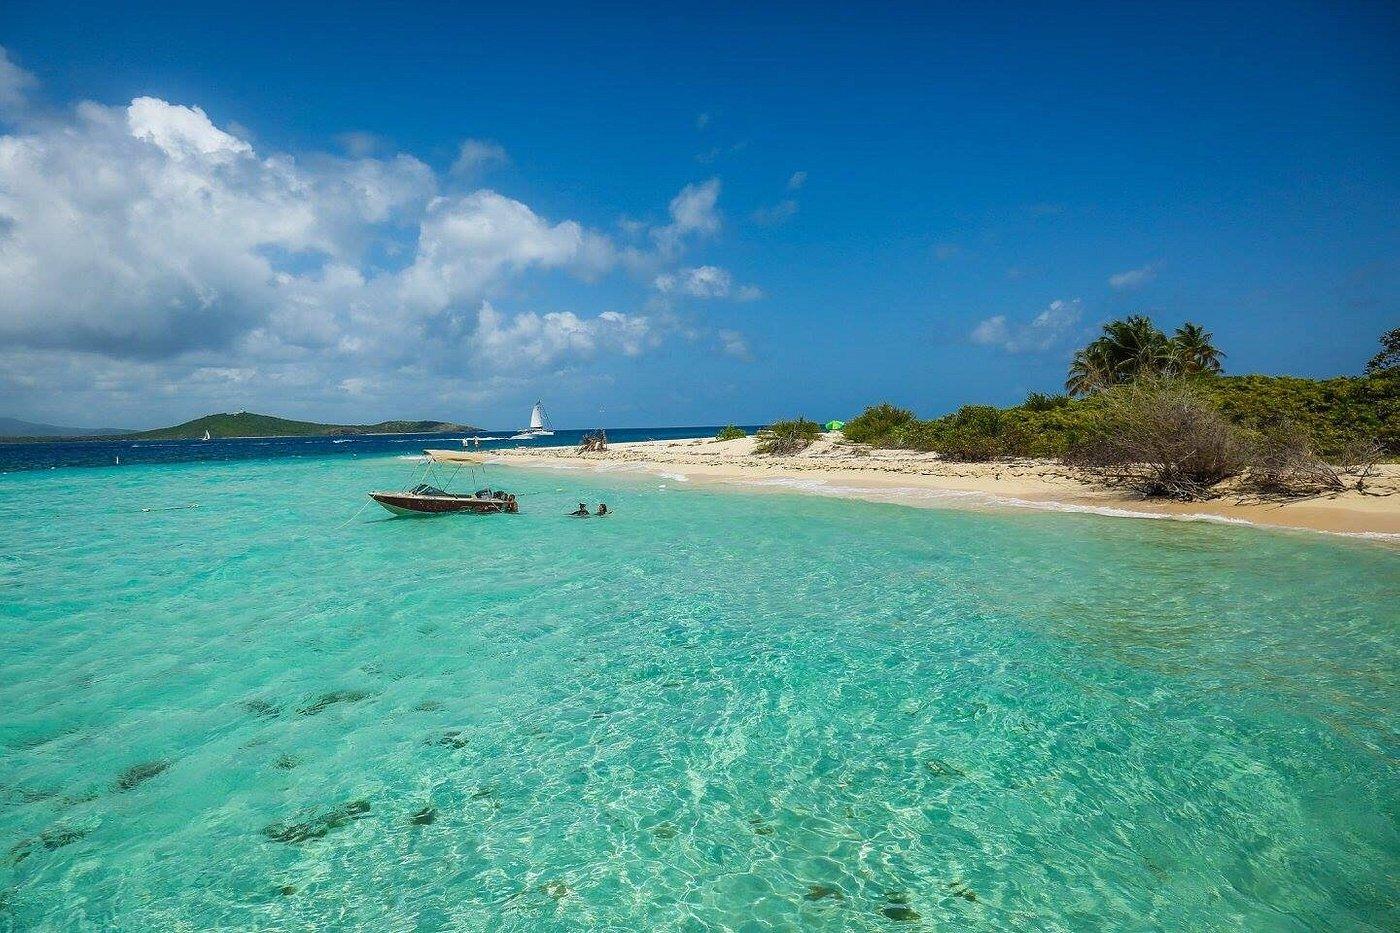 Icacos Island